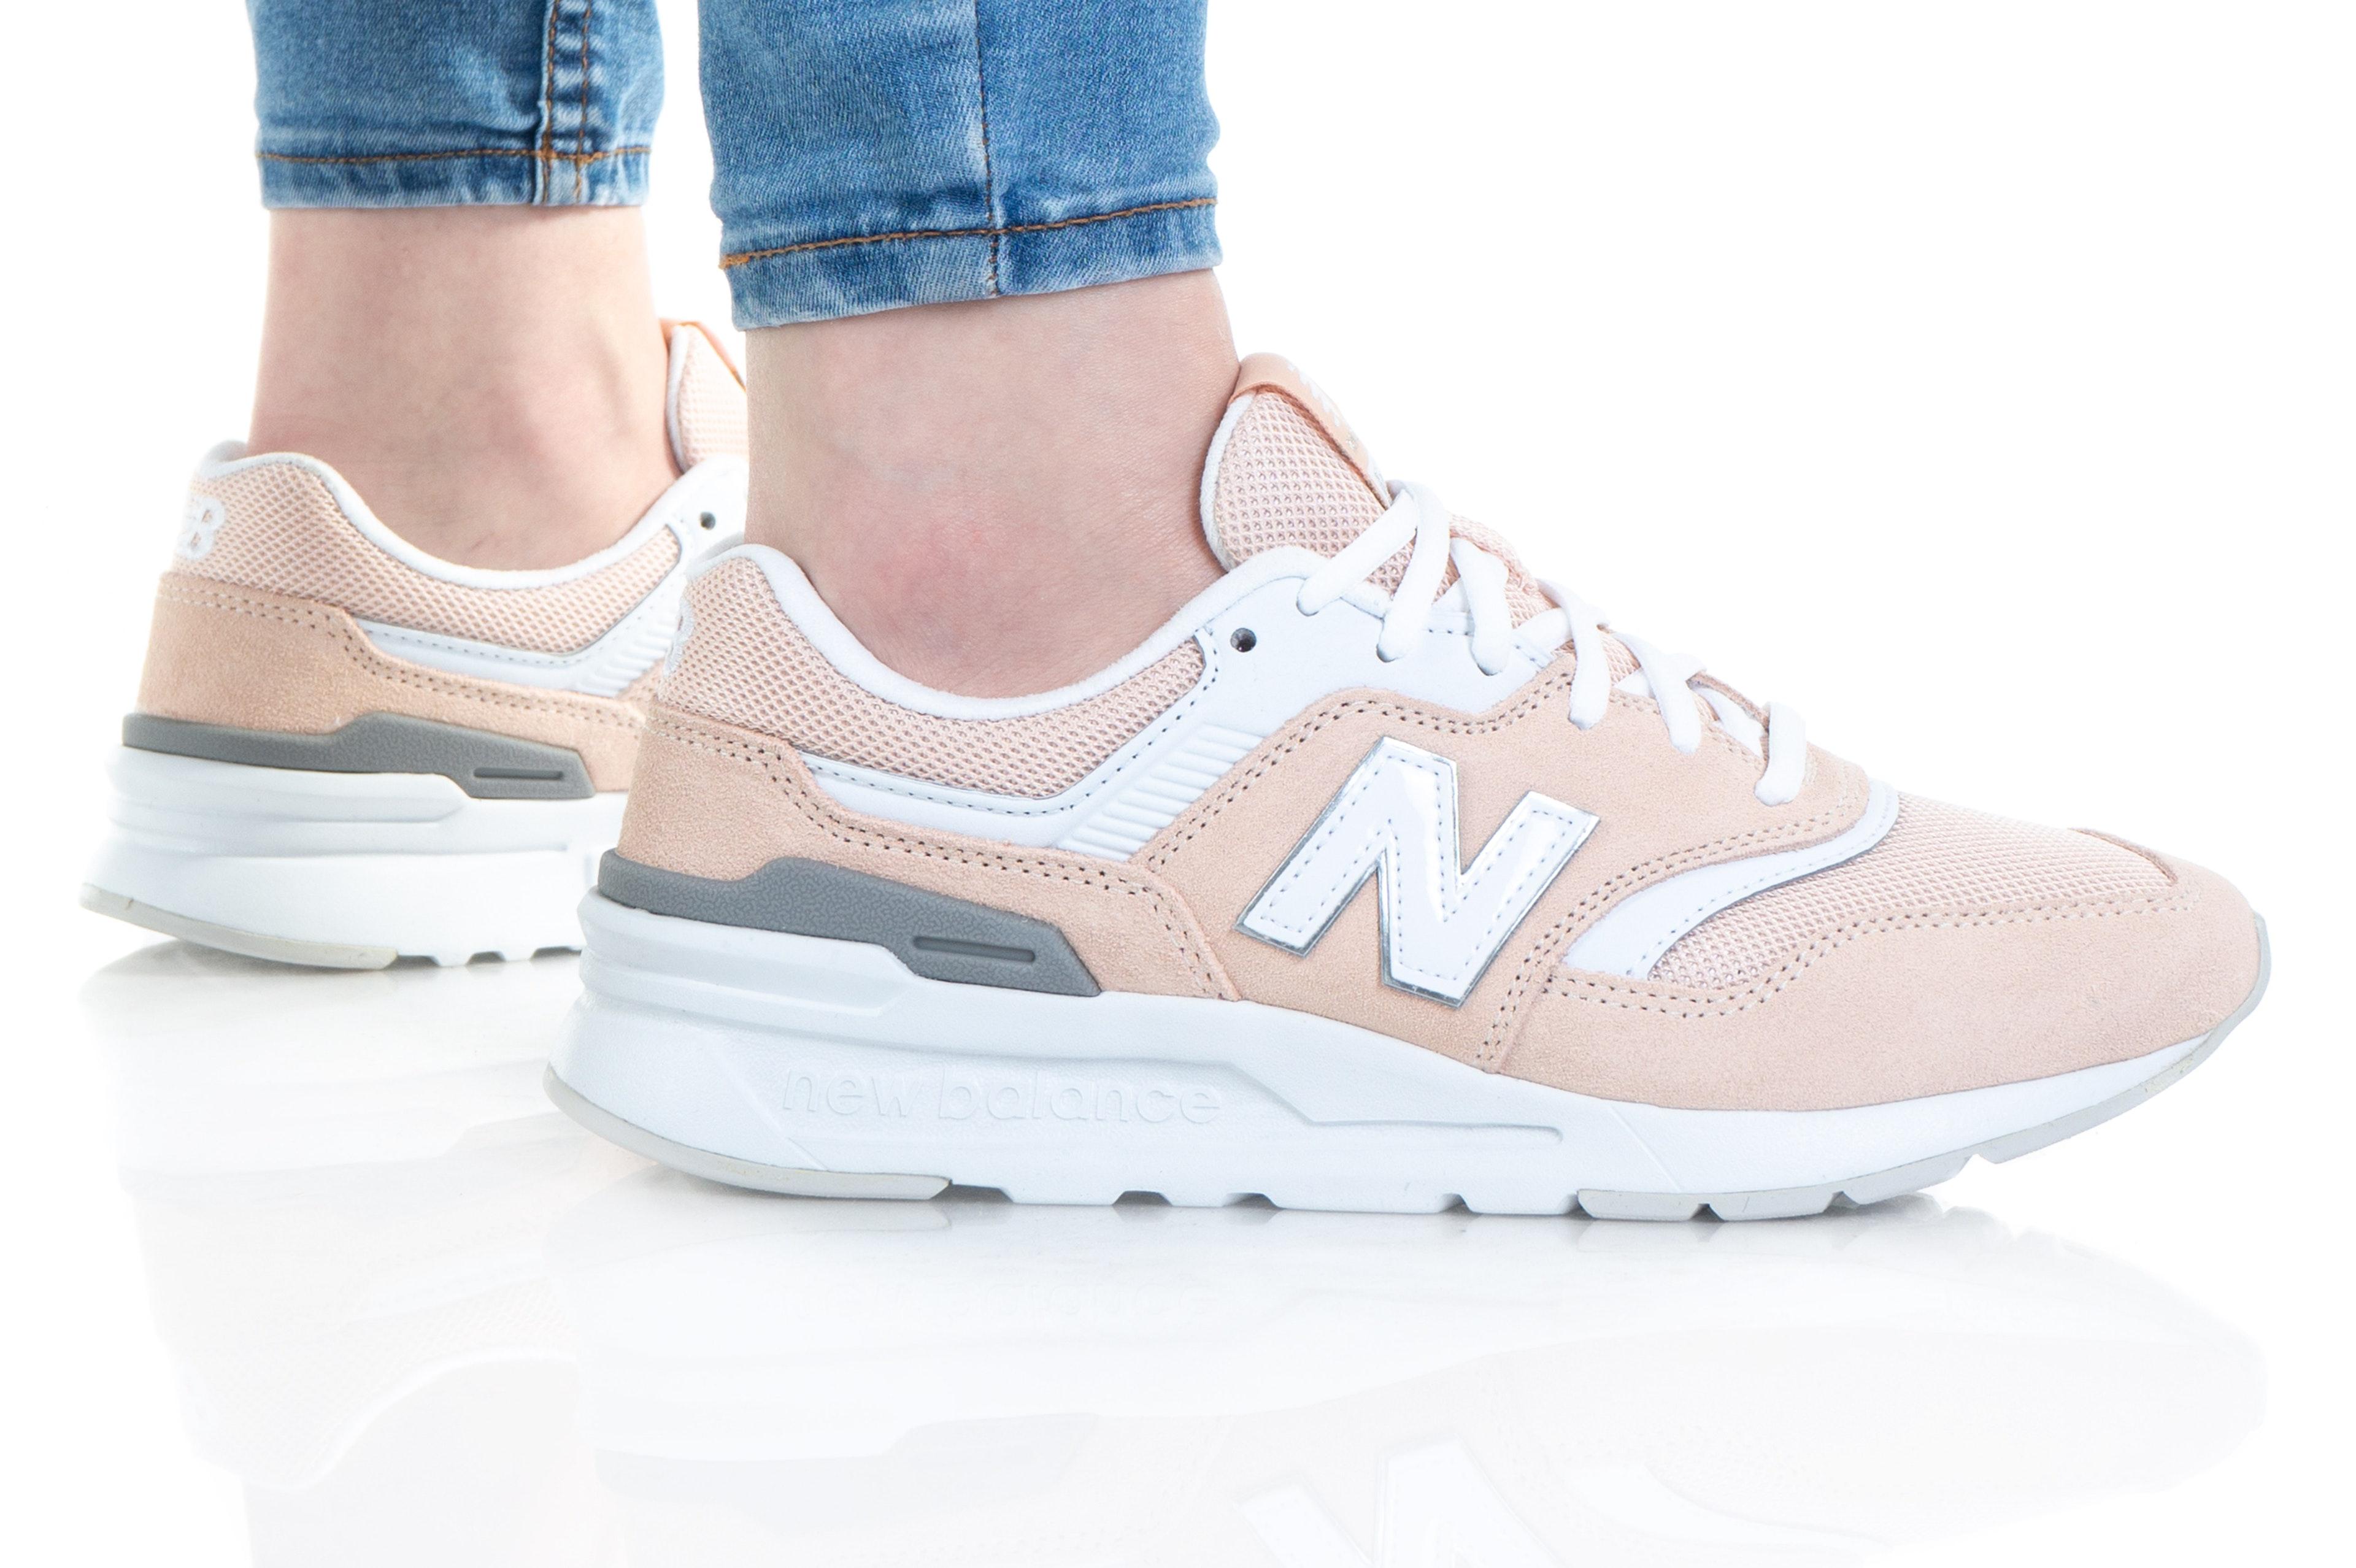 New Balance 997 CW997HCK